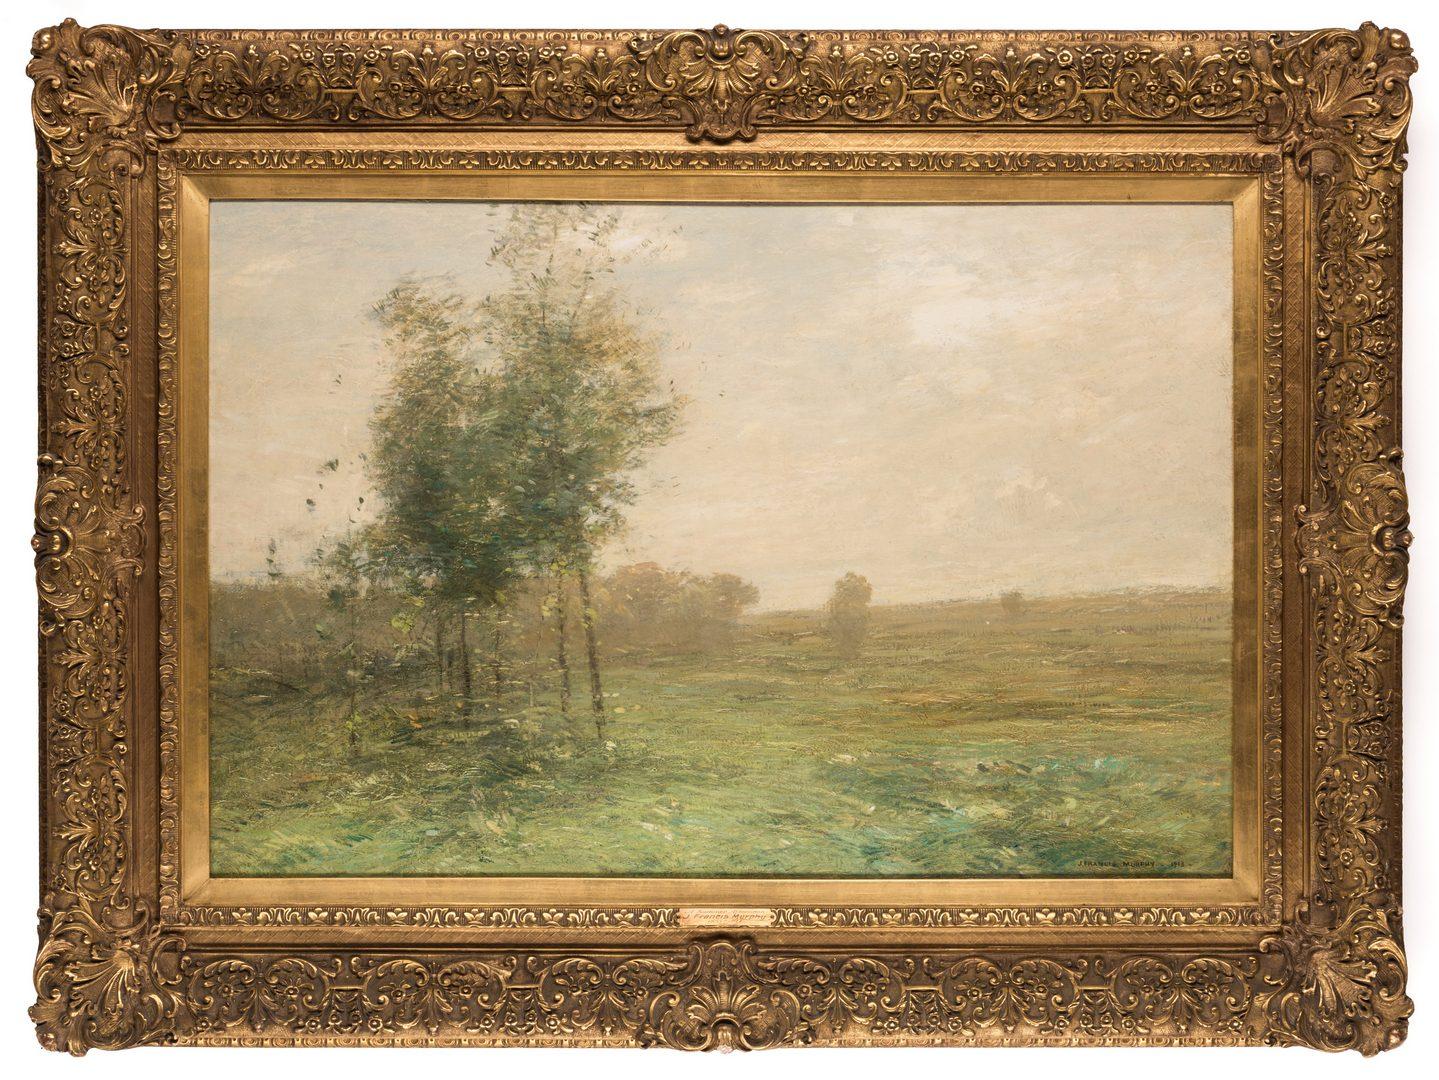 Lot 141: J. Francis Murphy Landscape Oil on Canvas